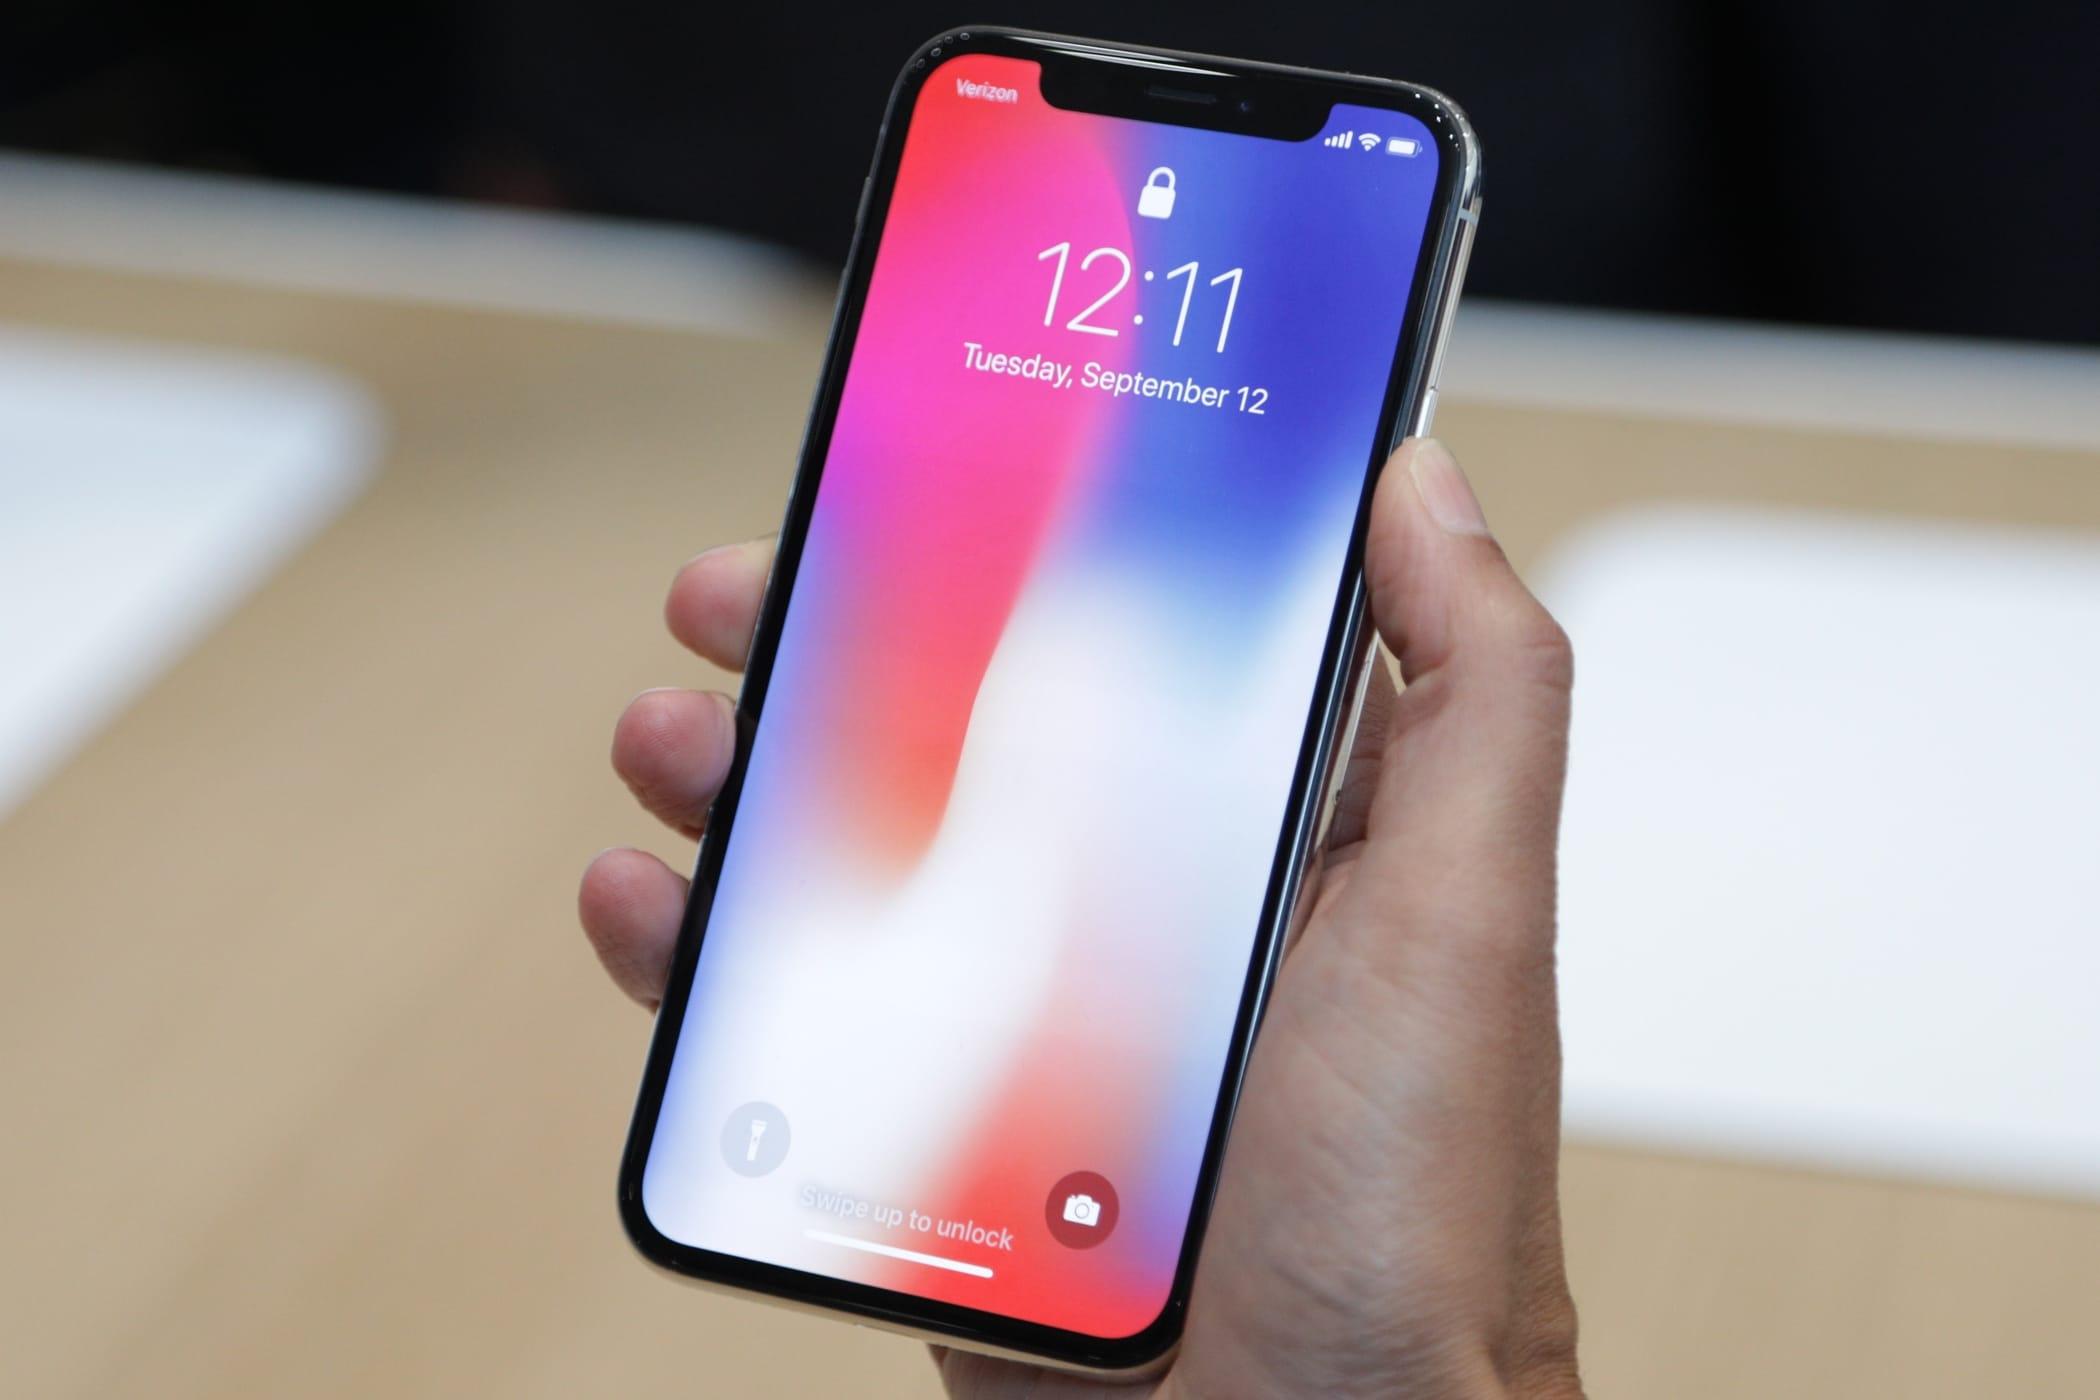 заработок в интернете с телефона apple